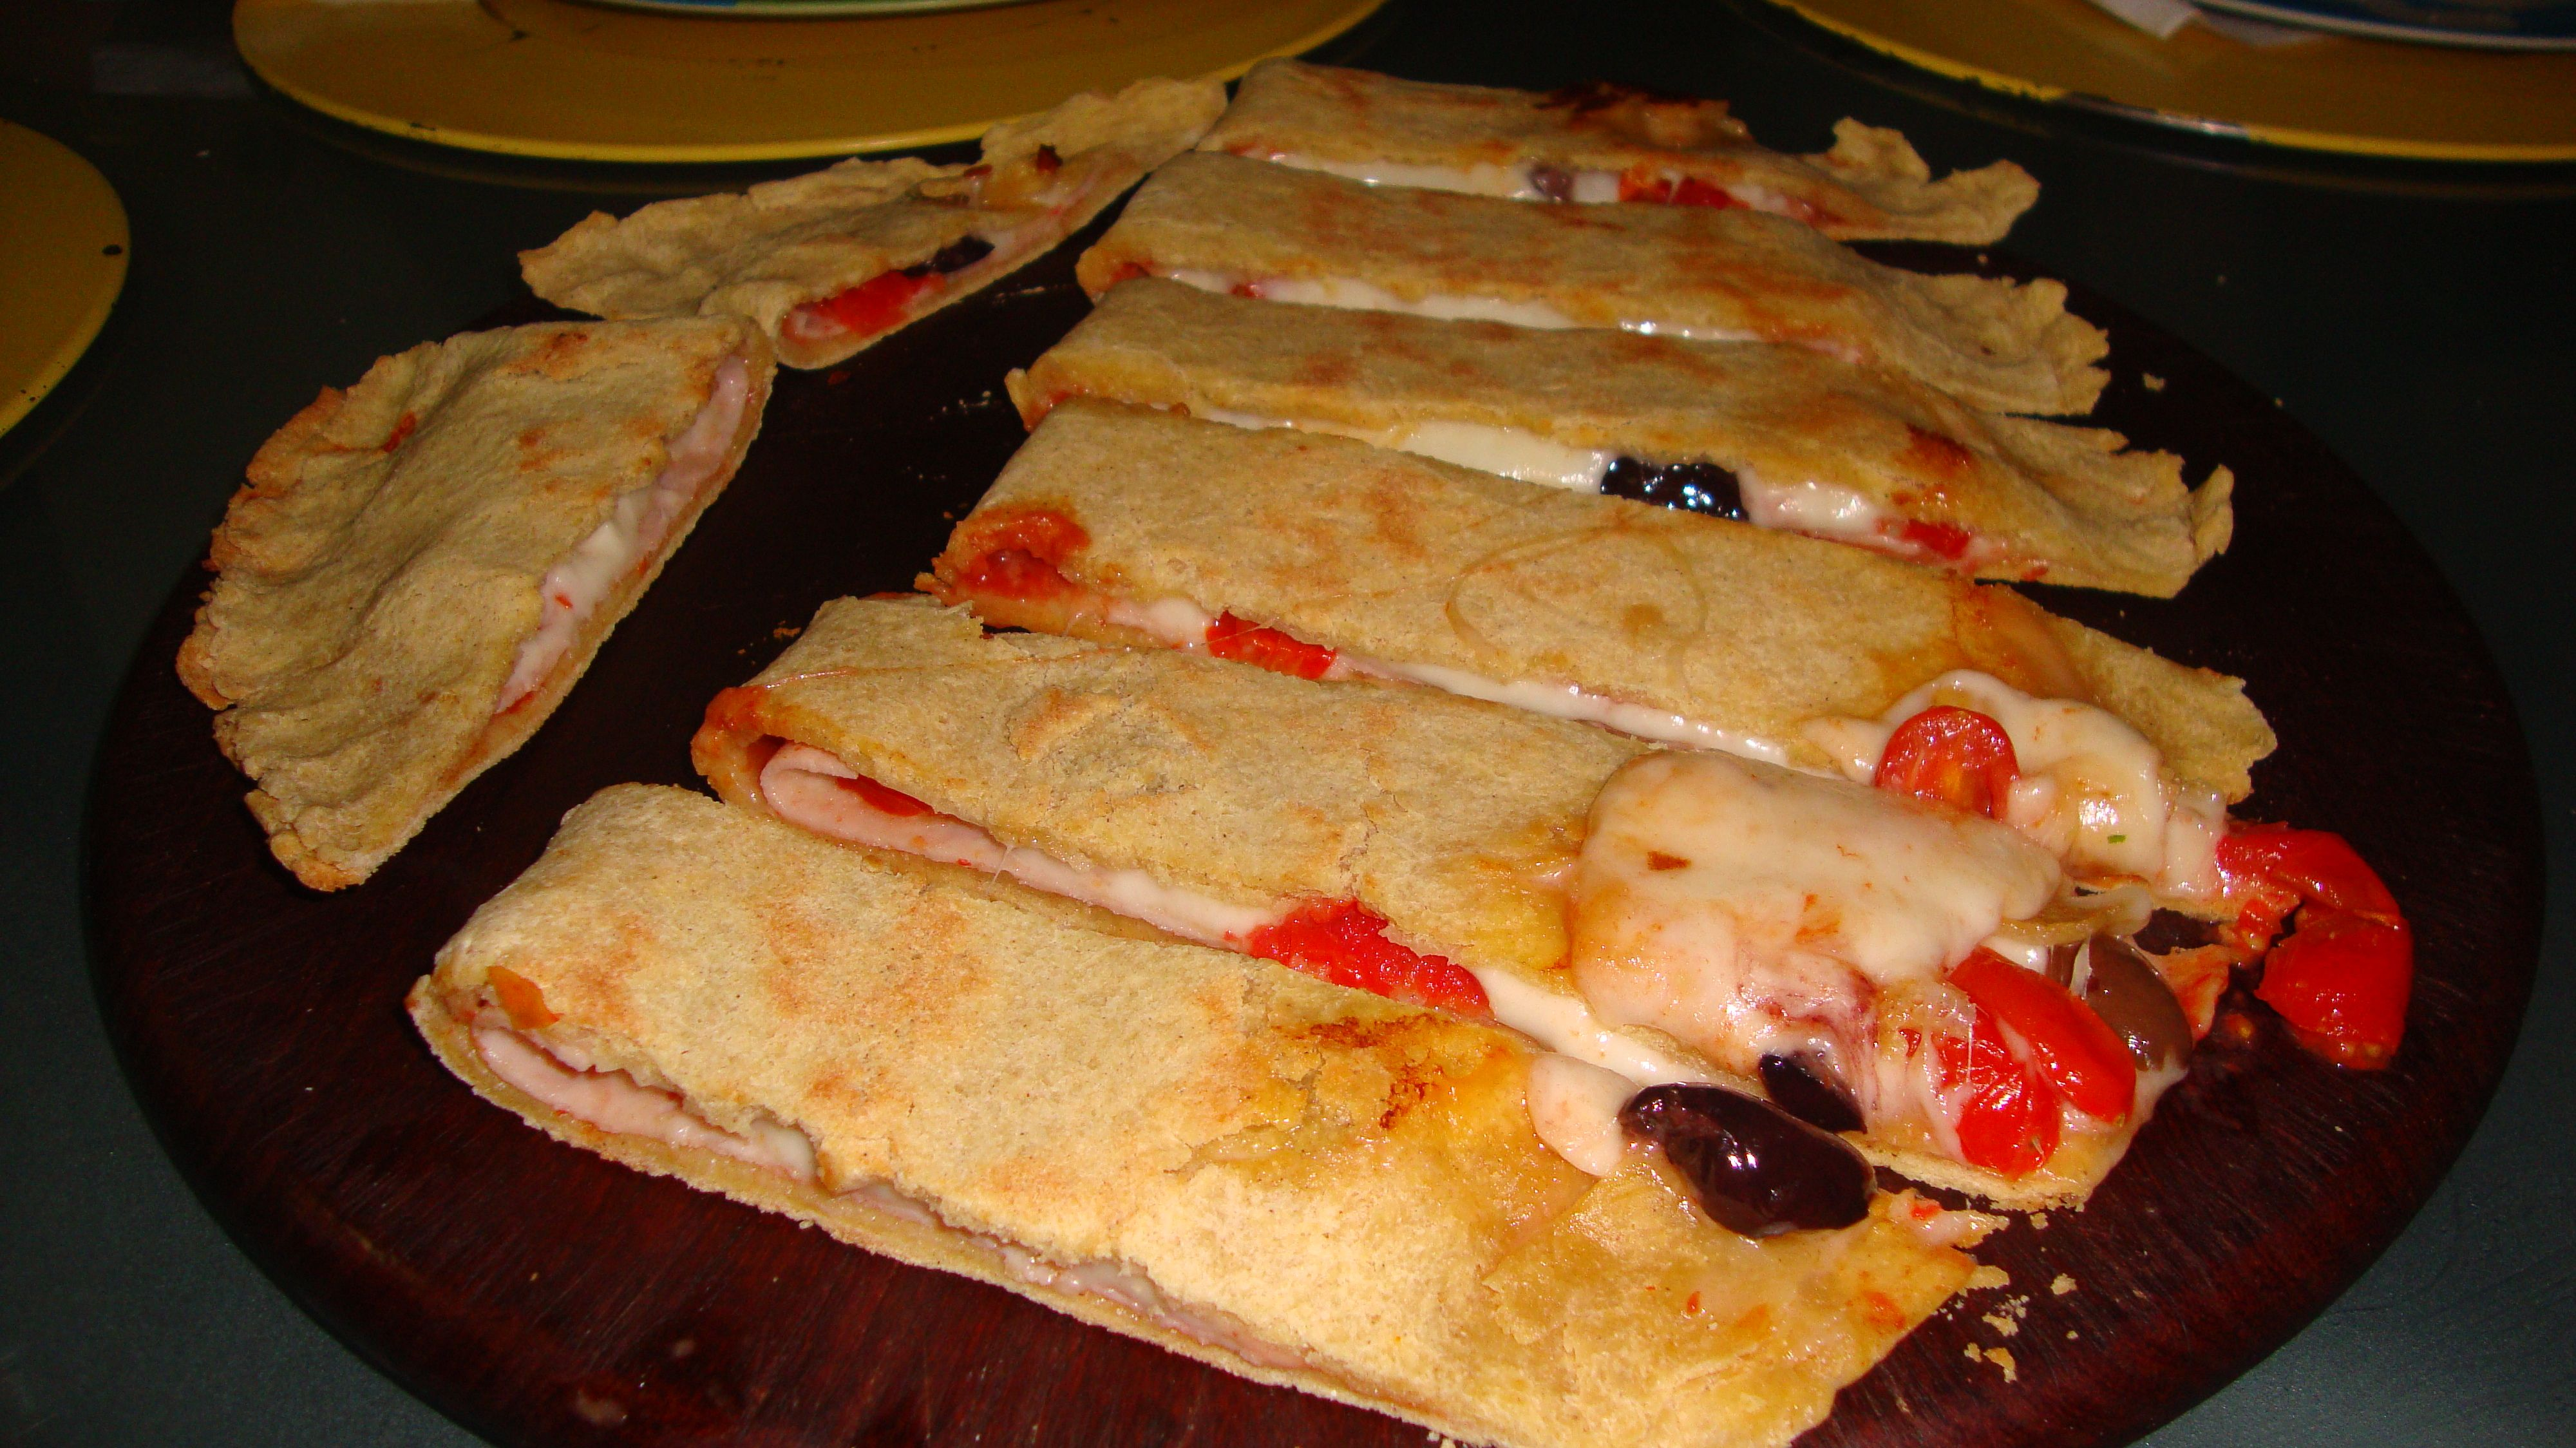 Calzone: Salsa de tomate, mozzarella, tomate bola natural, jamón, salami y aceitunas kalamata